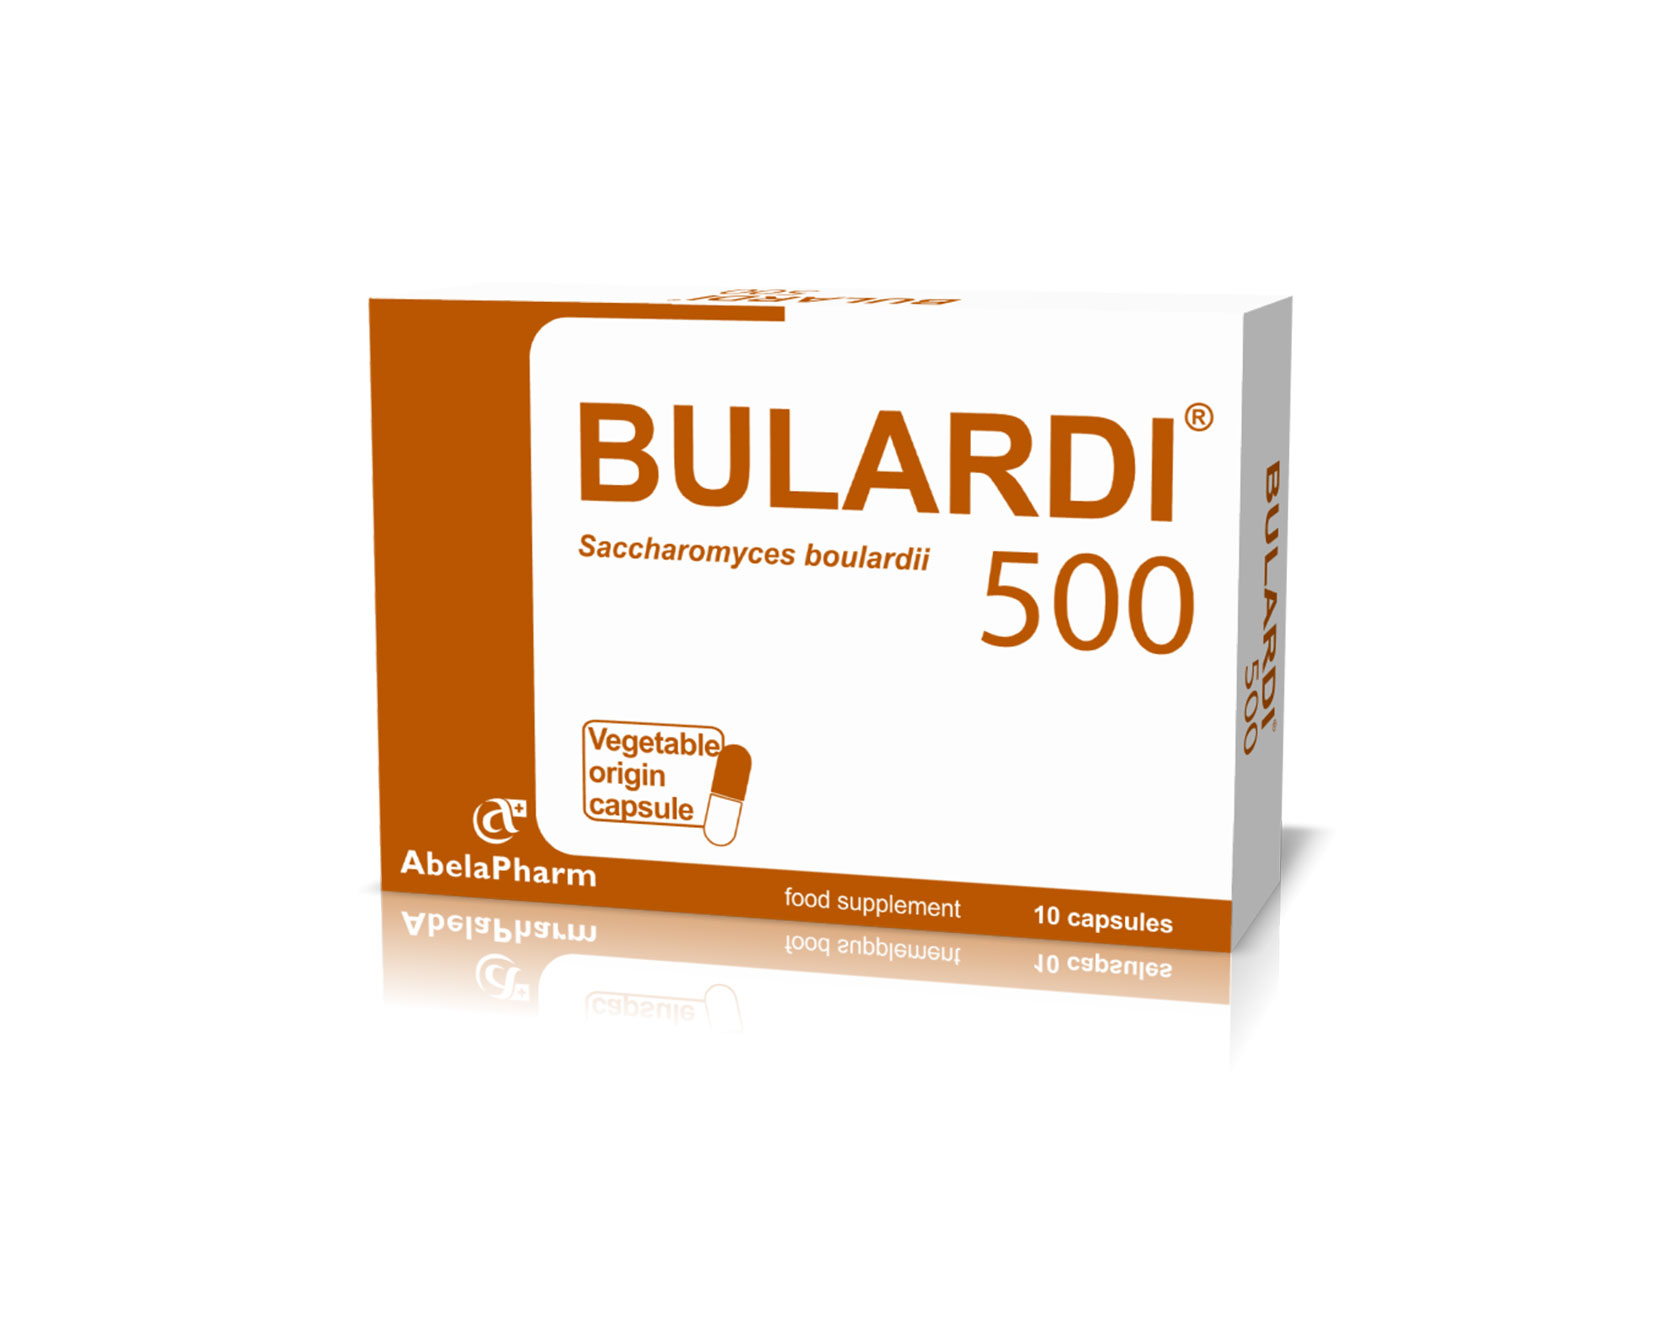 Bulardi 500 Probiotic